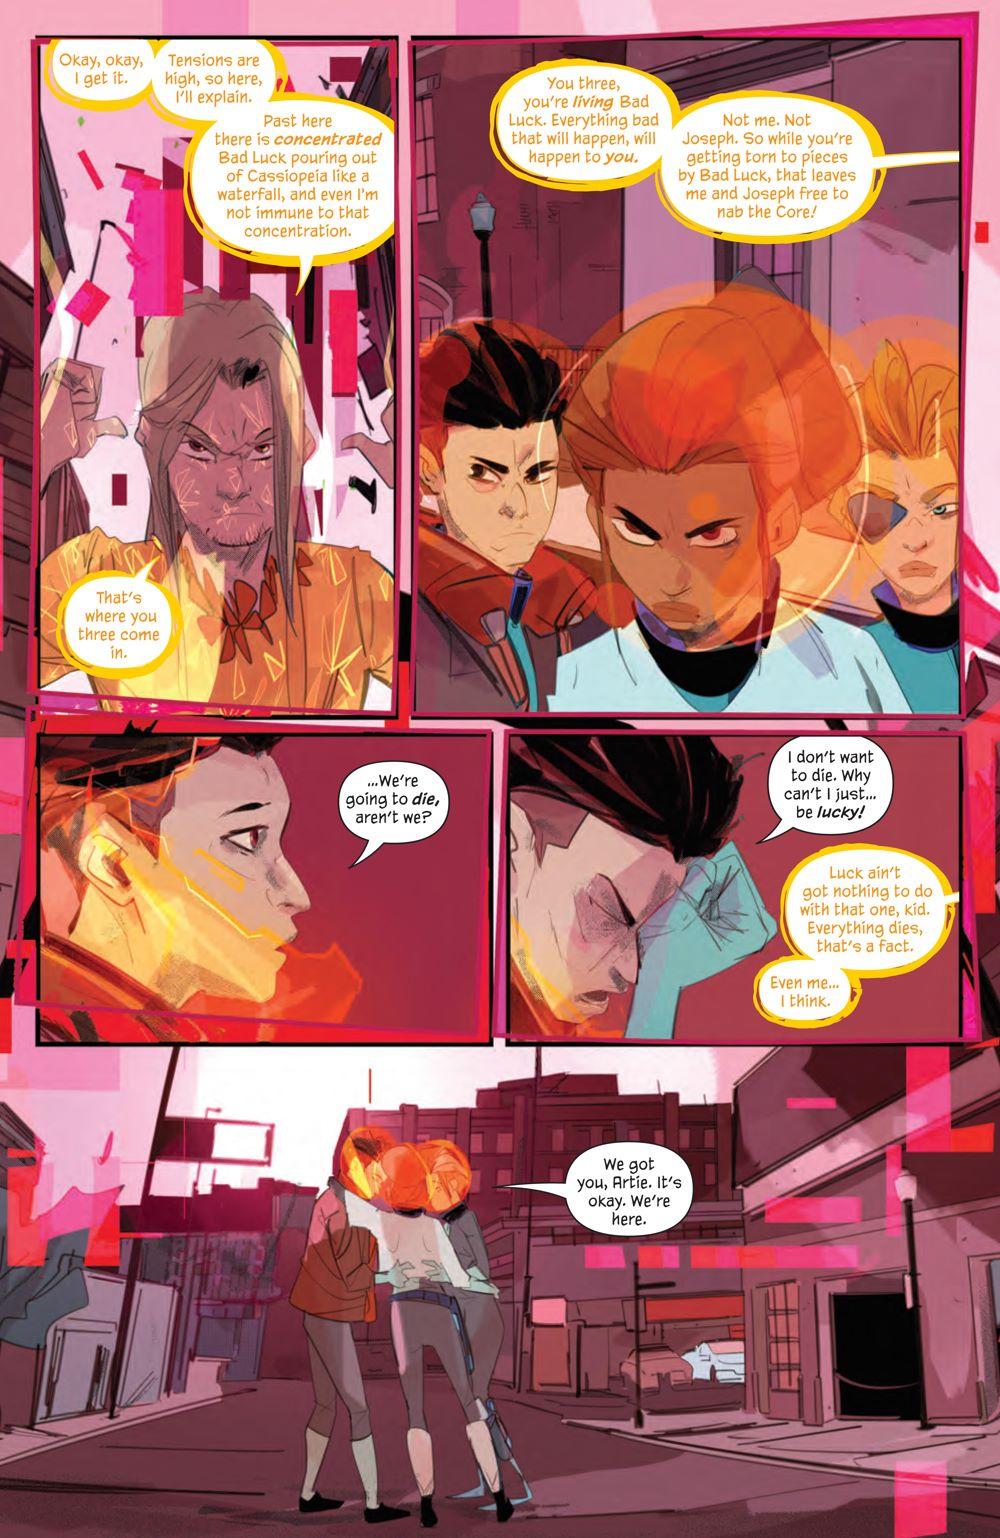 GoodLuck_004_PRESS_7 ComicList Previews: GOOD LUCK #4 (OF 5)